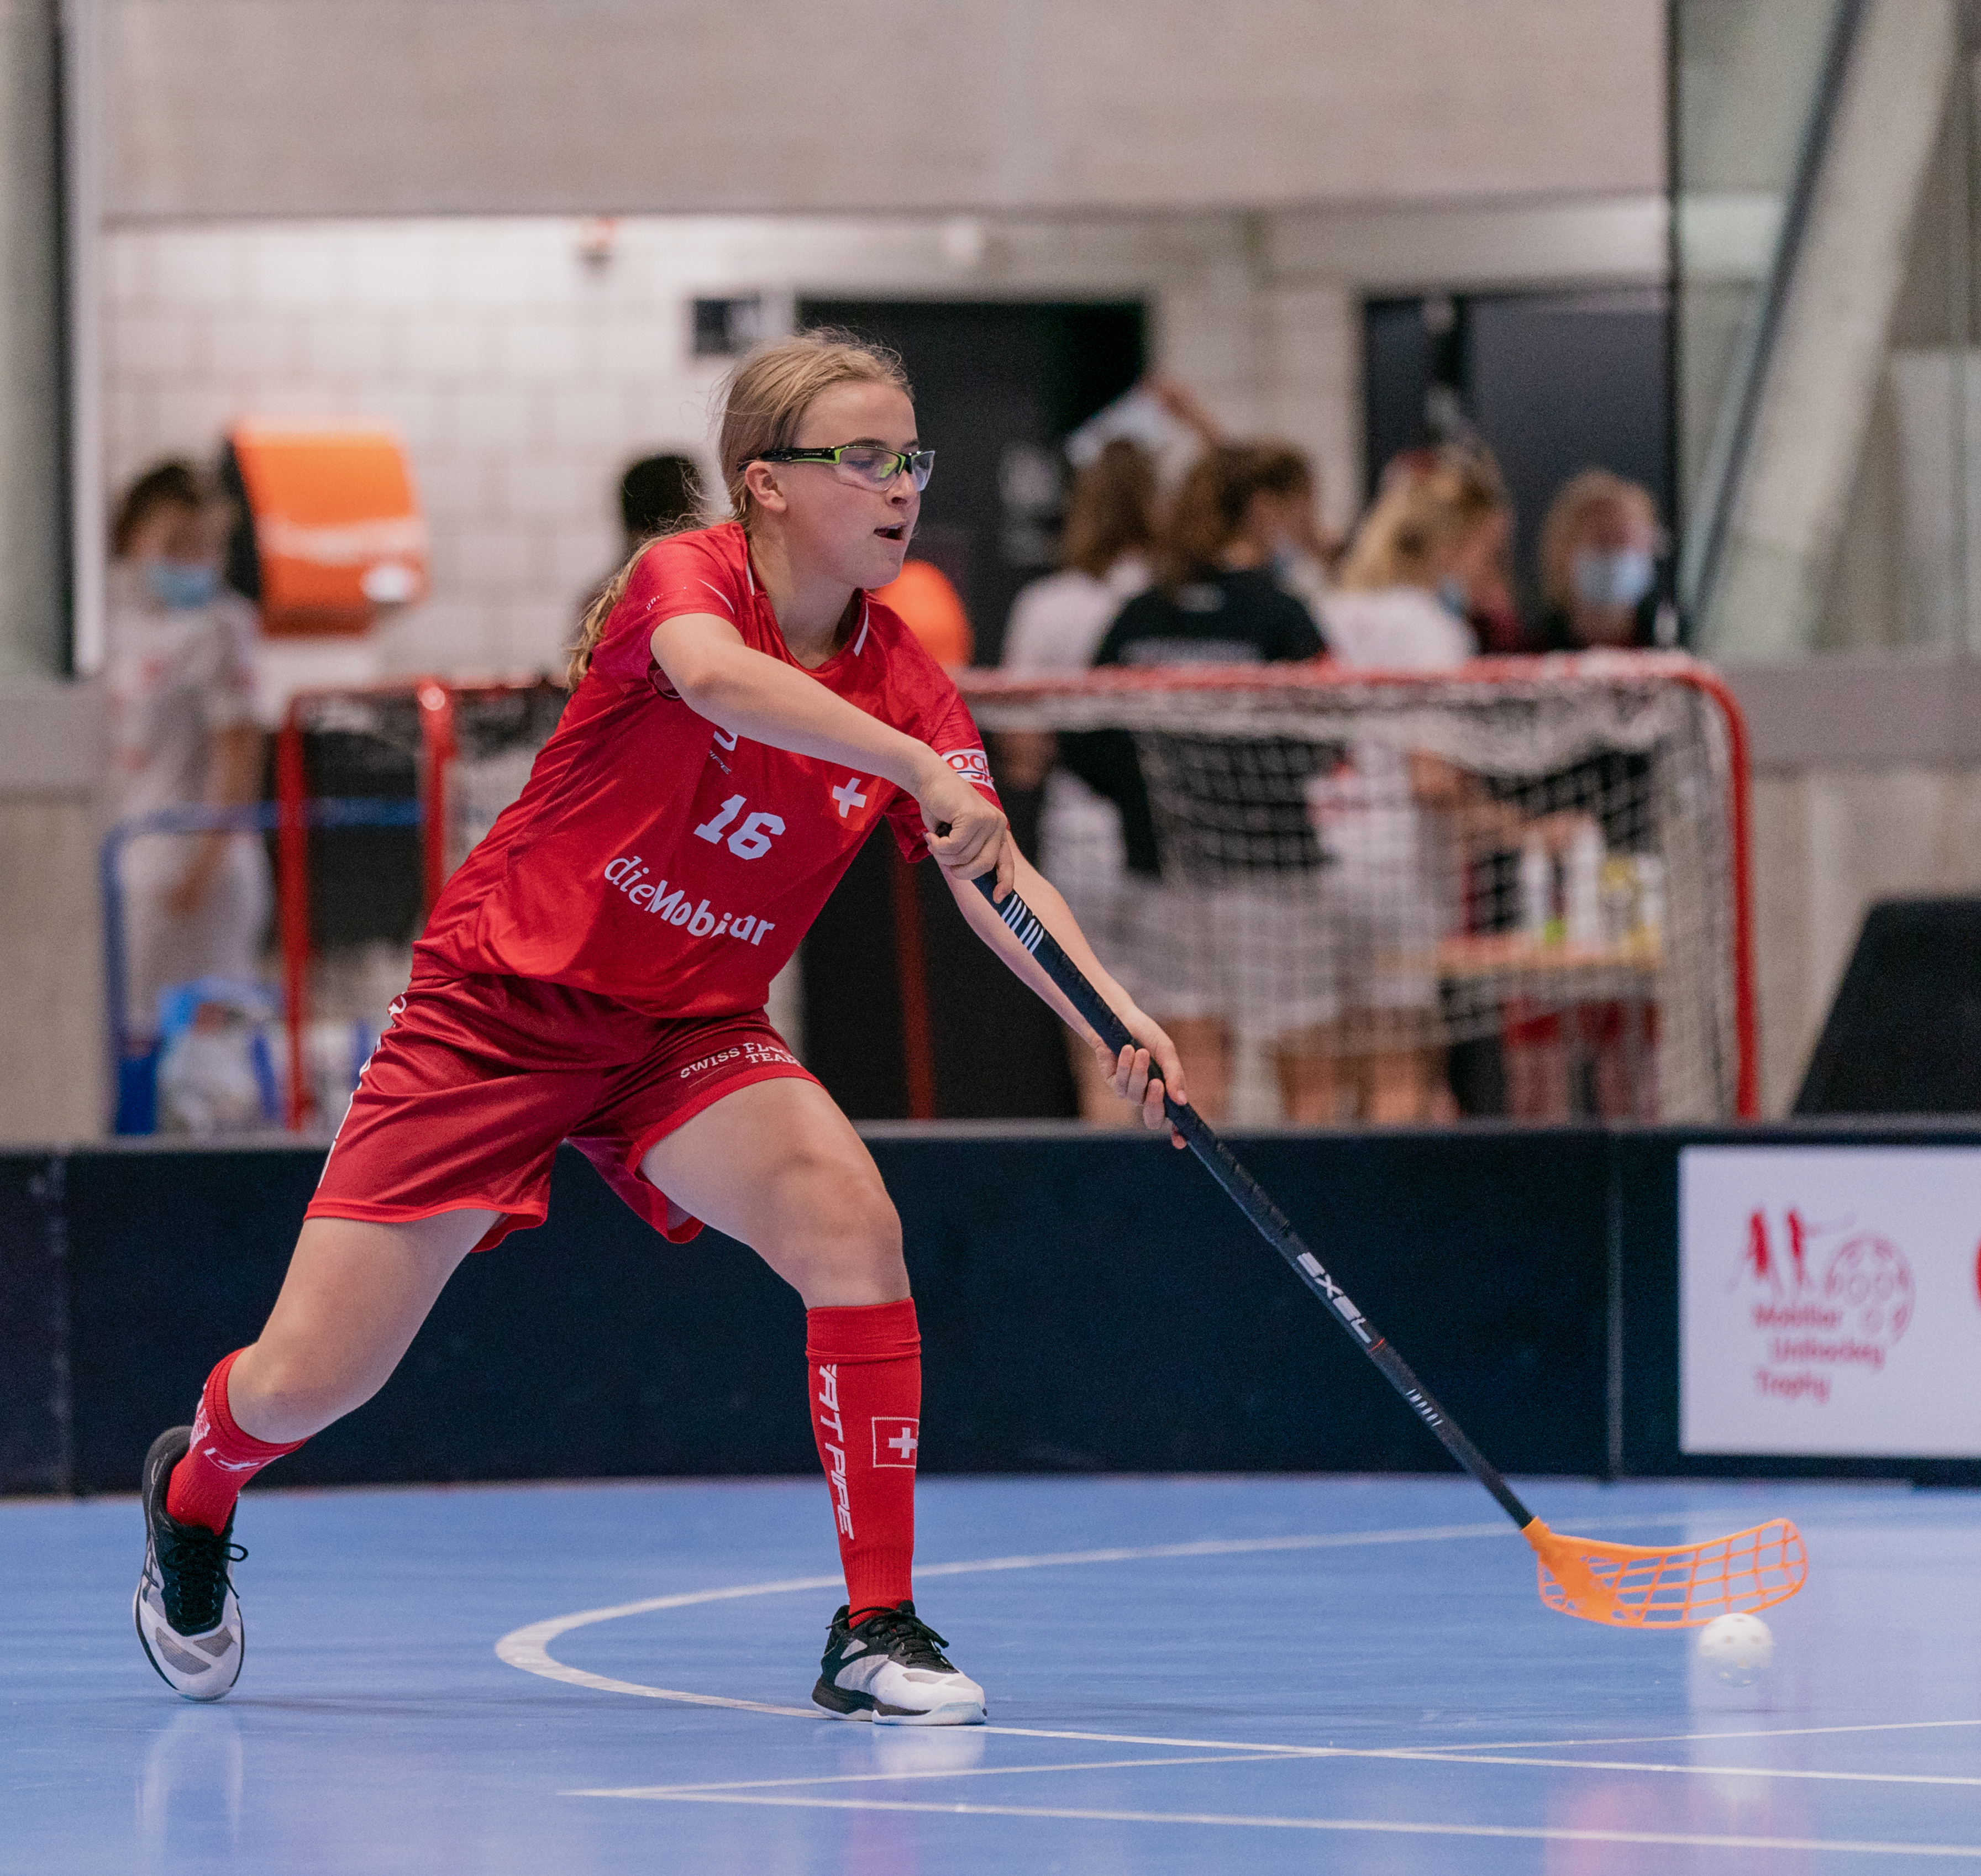 U21-Spielerin Jill Wiedmer im U17-Trainingscamp der Nationalmannschaft